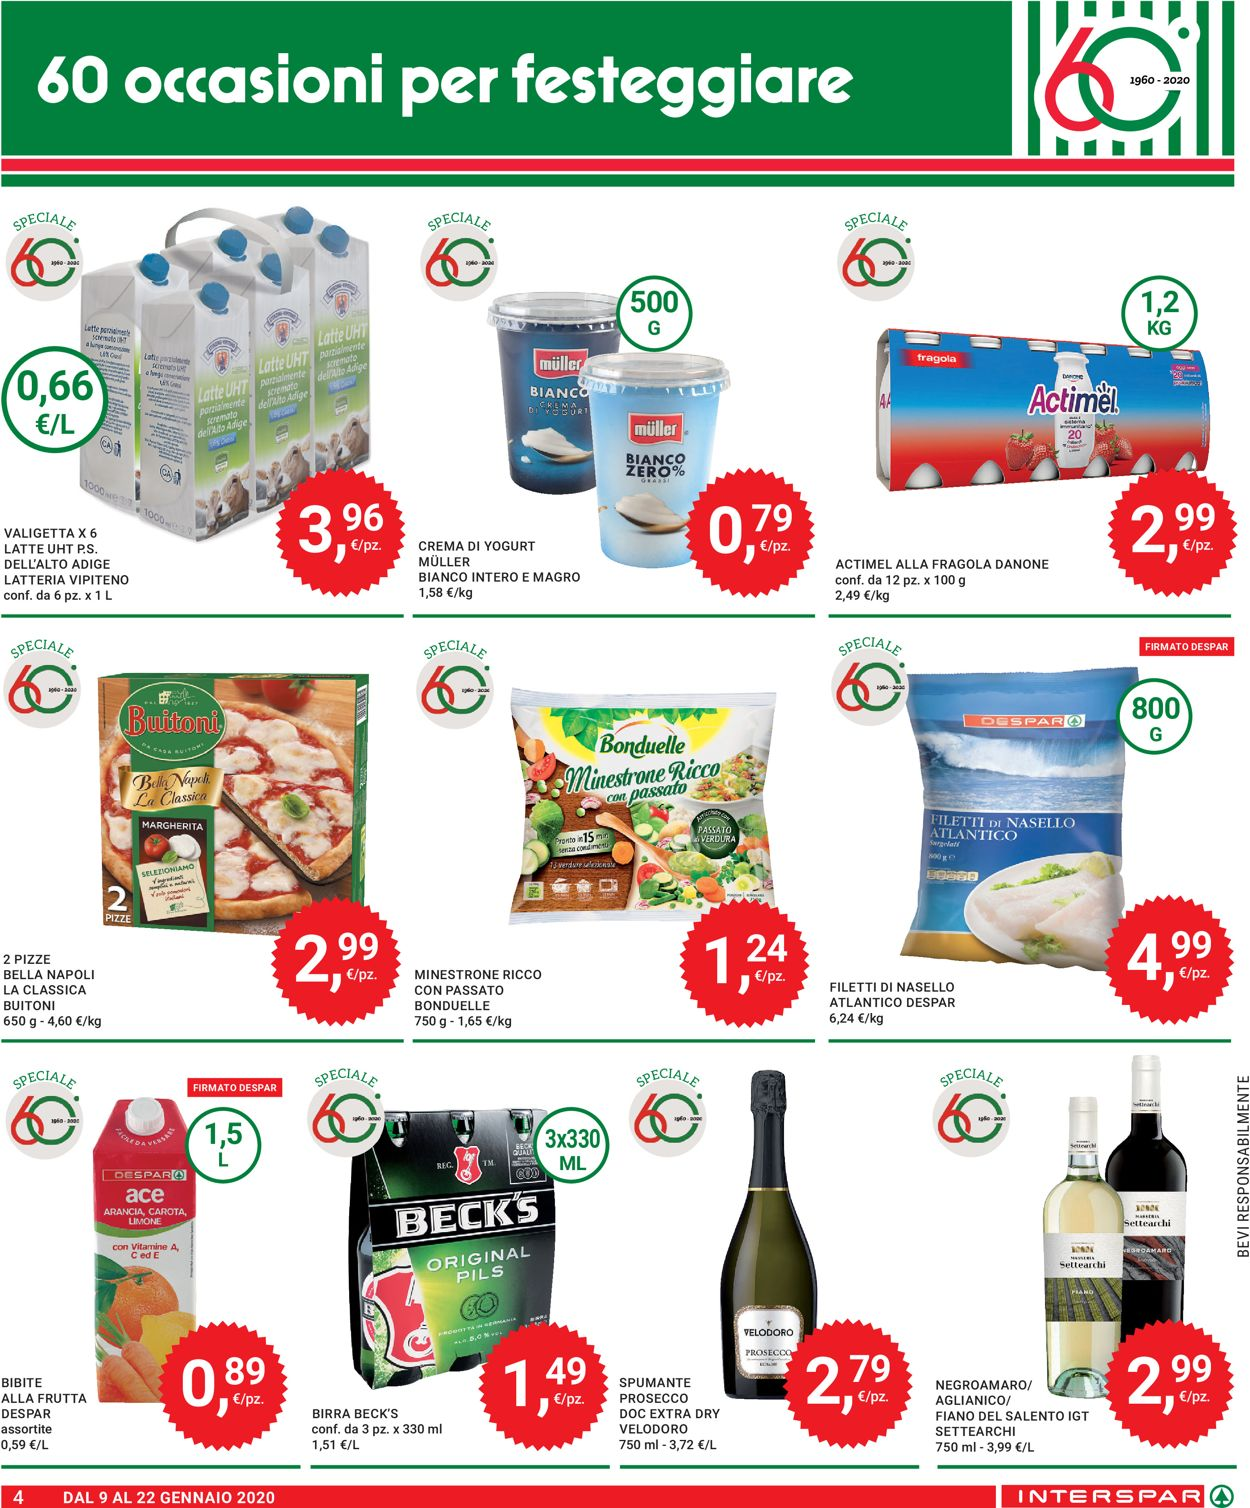 Volantino Interspar - Offerte 09/01-22/01/2020 (Pagina 4)